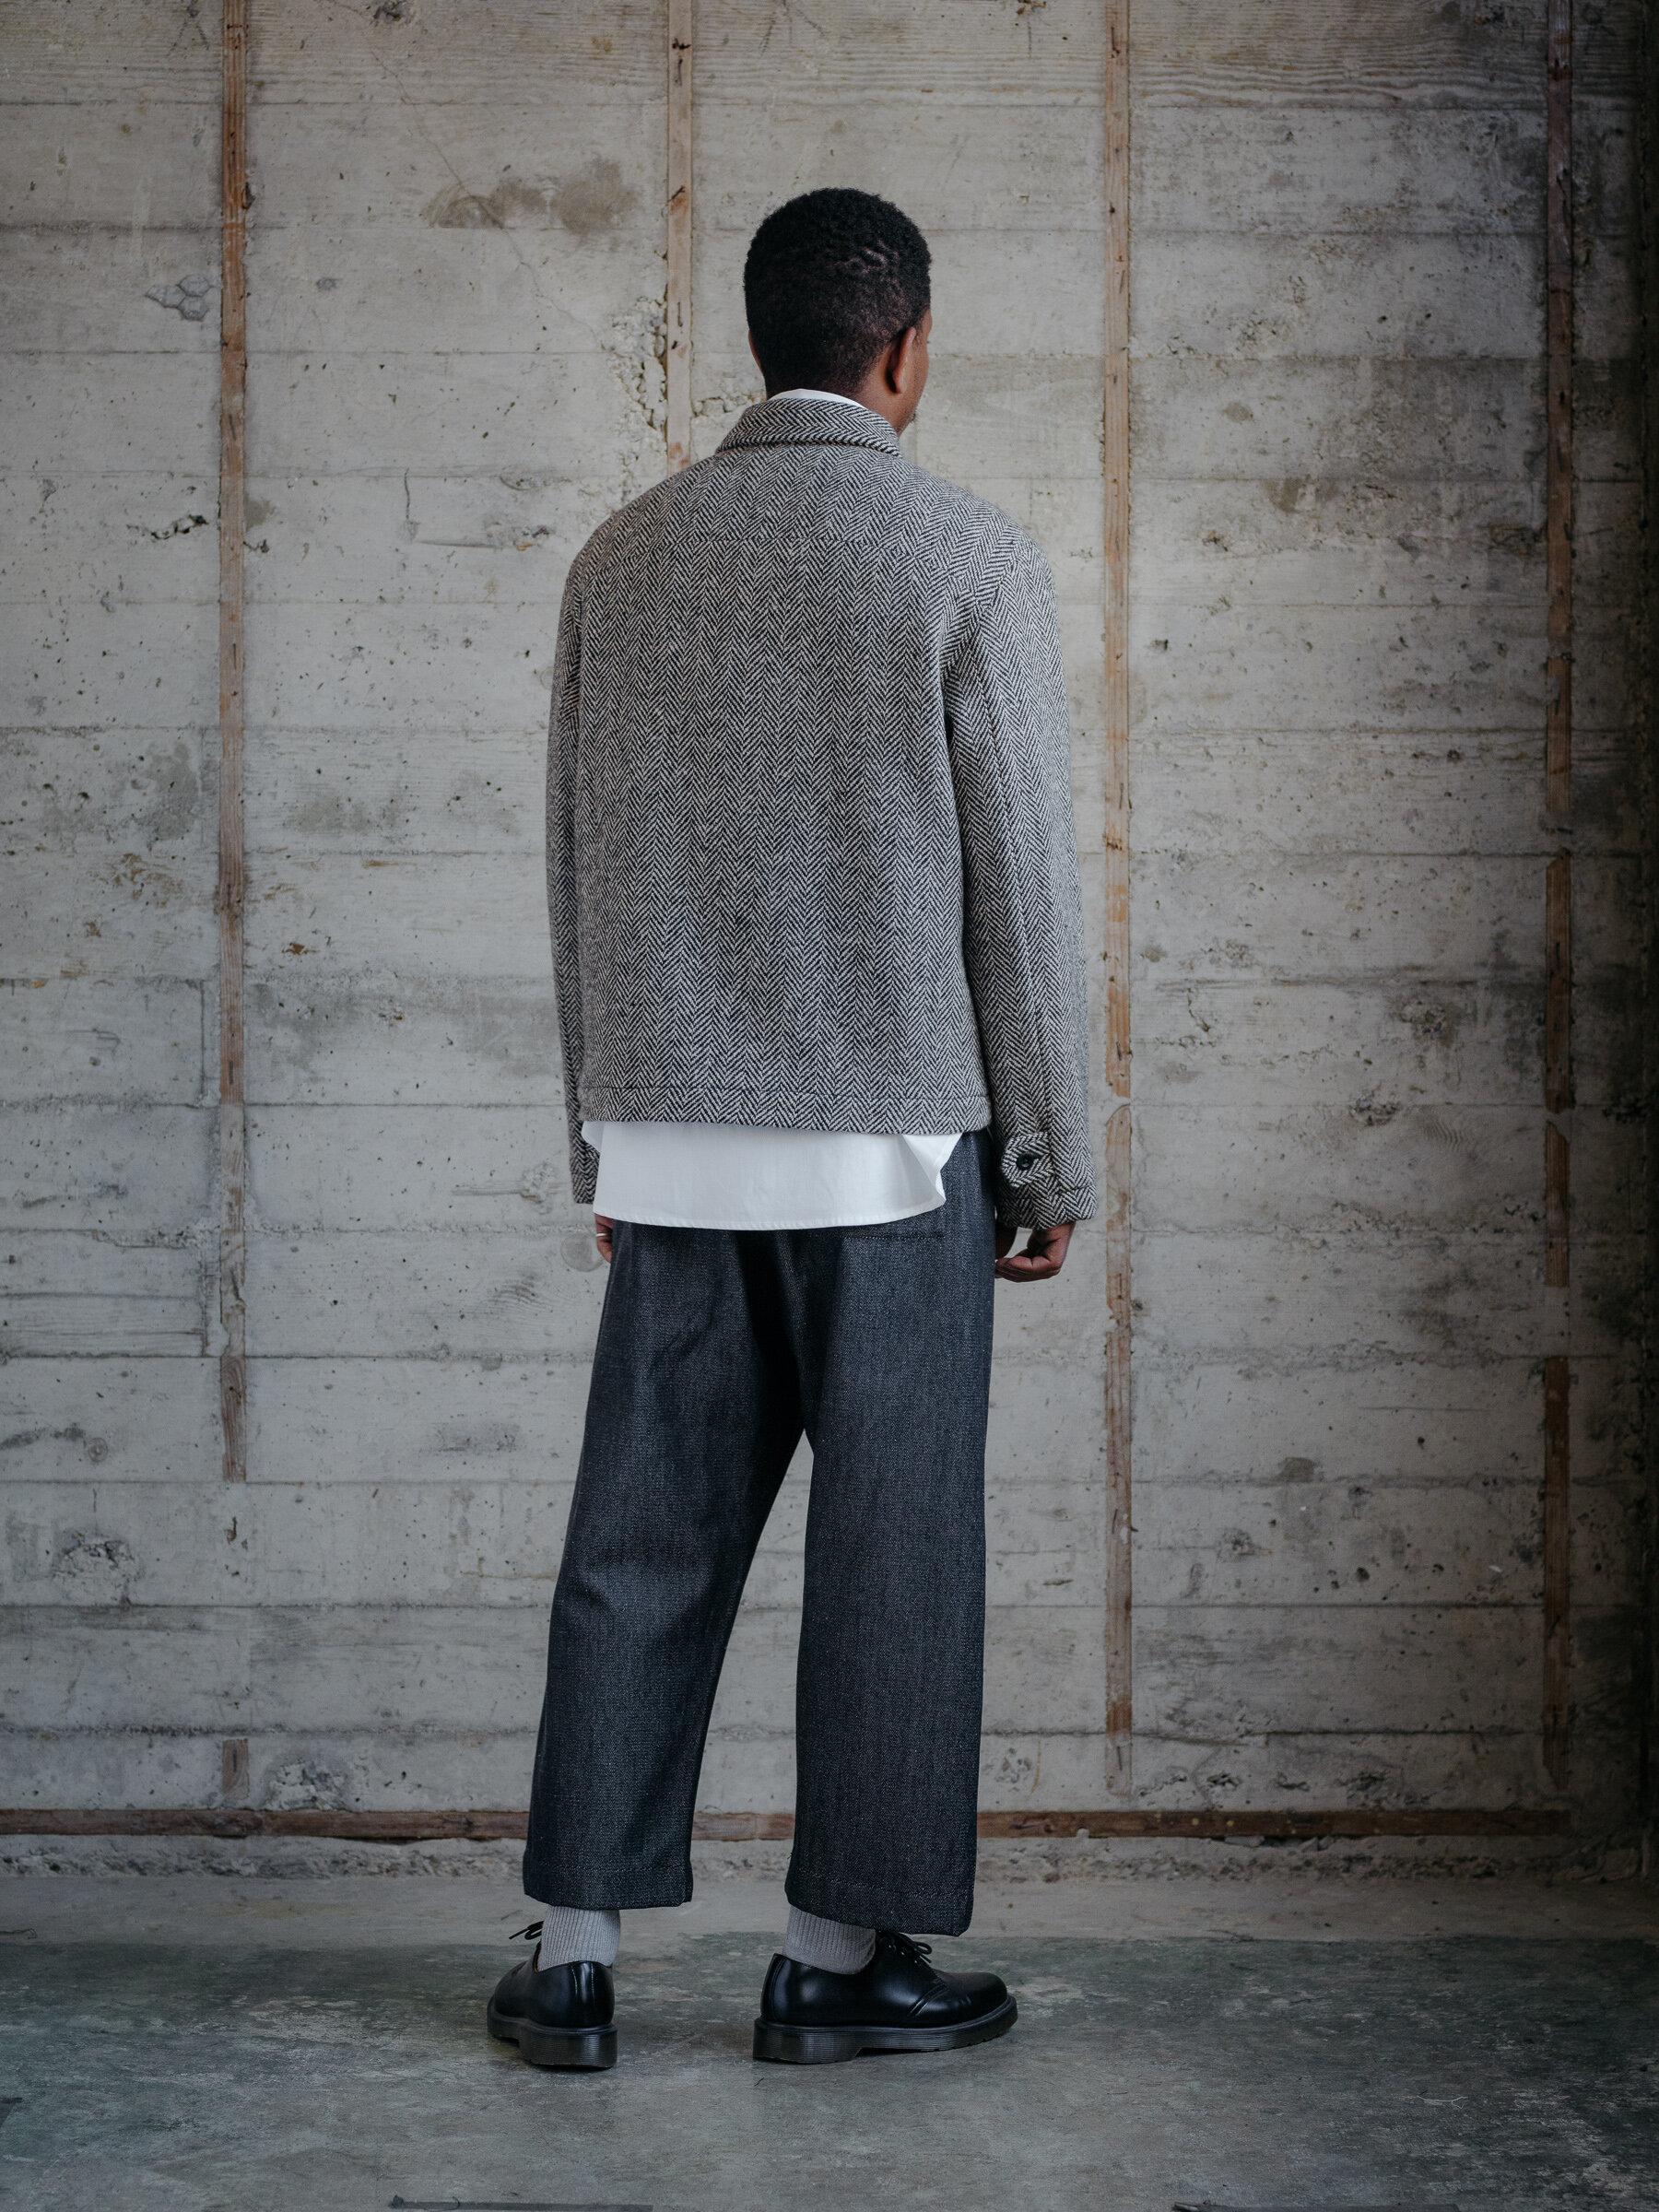 evan-kinori-zip-jacket-lambswool-herringbone-woven-in-ireland-made-in-california-3